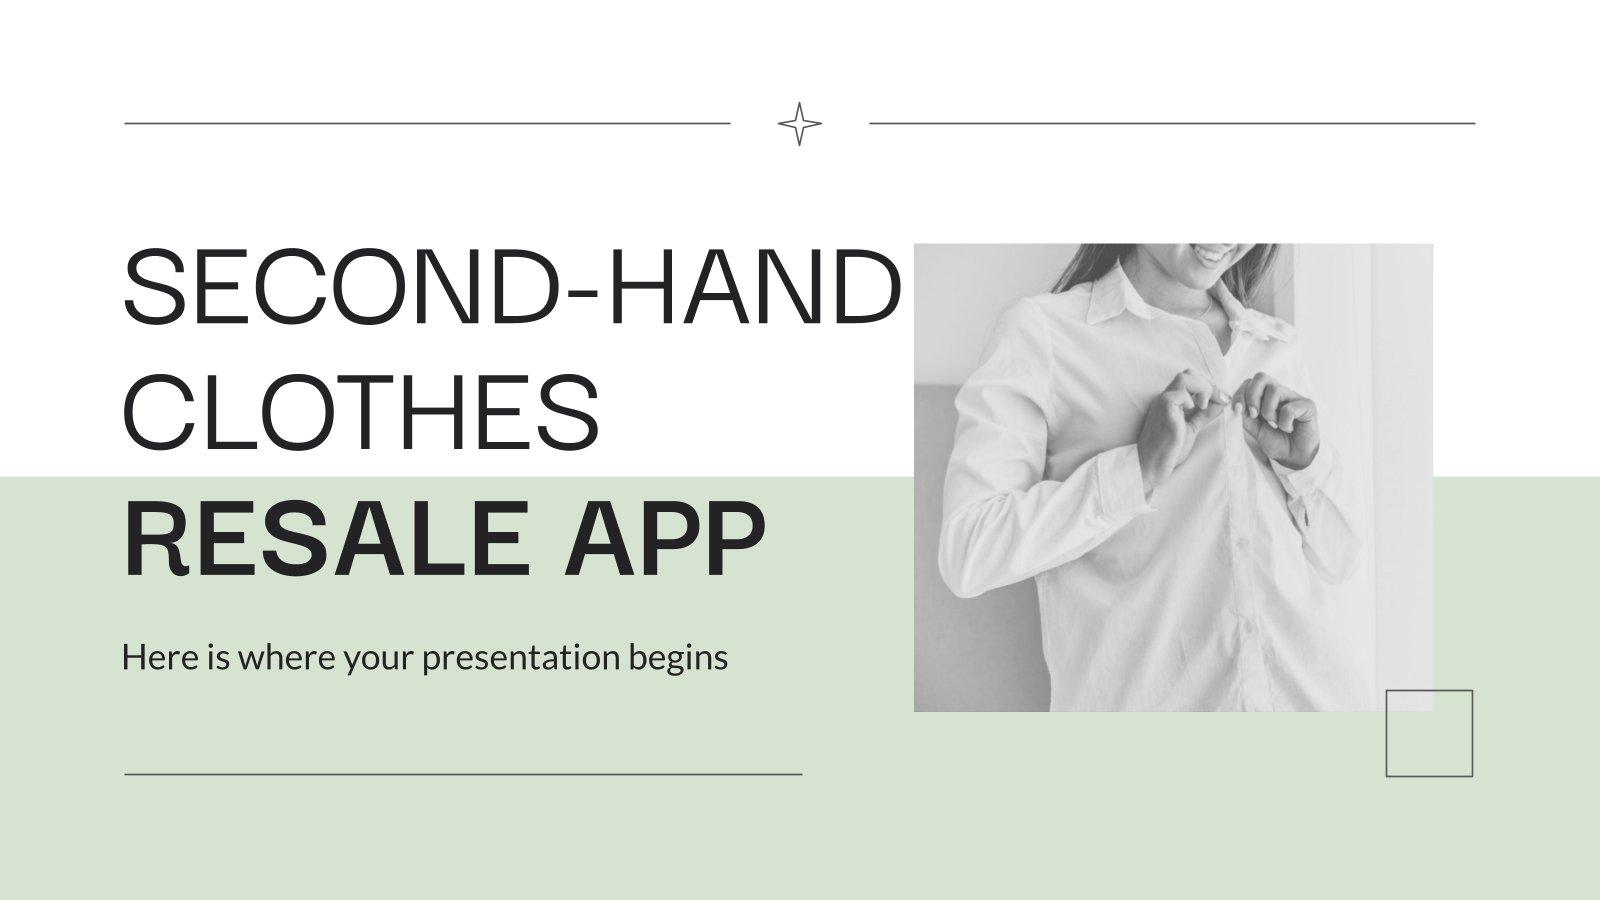 Second-hand Clothes Resale App presentation template